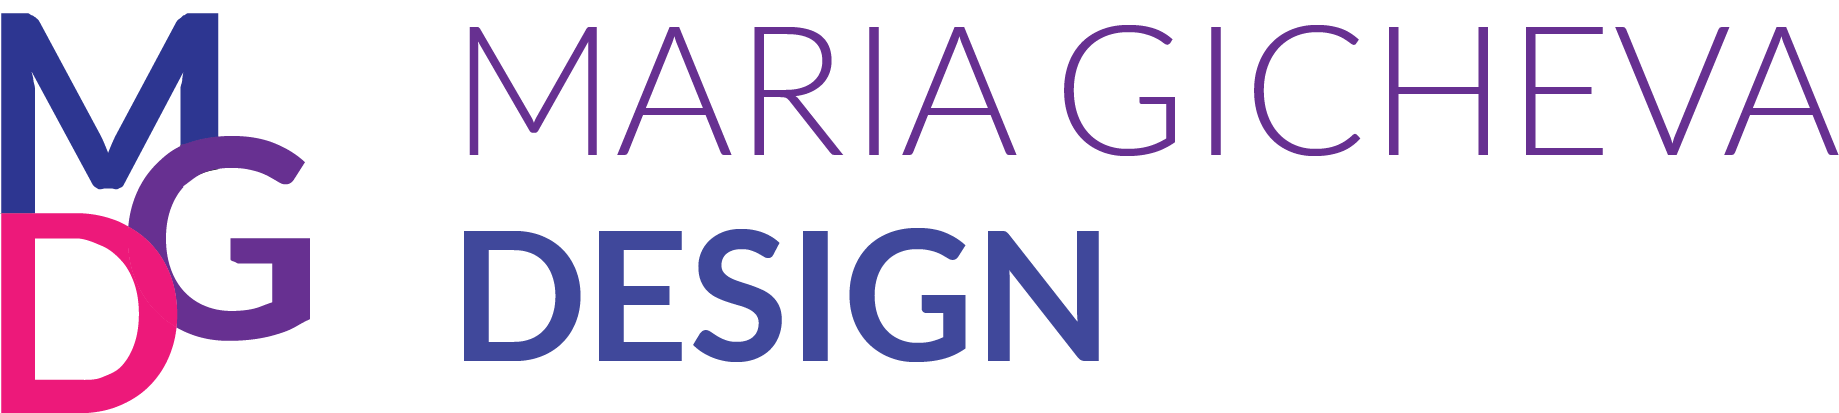 Maria Gicheva Design